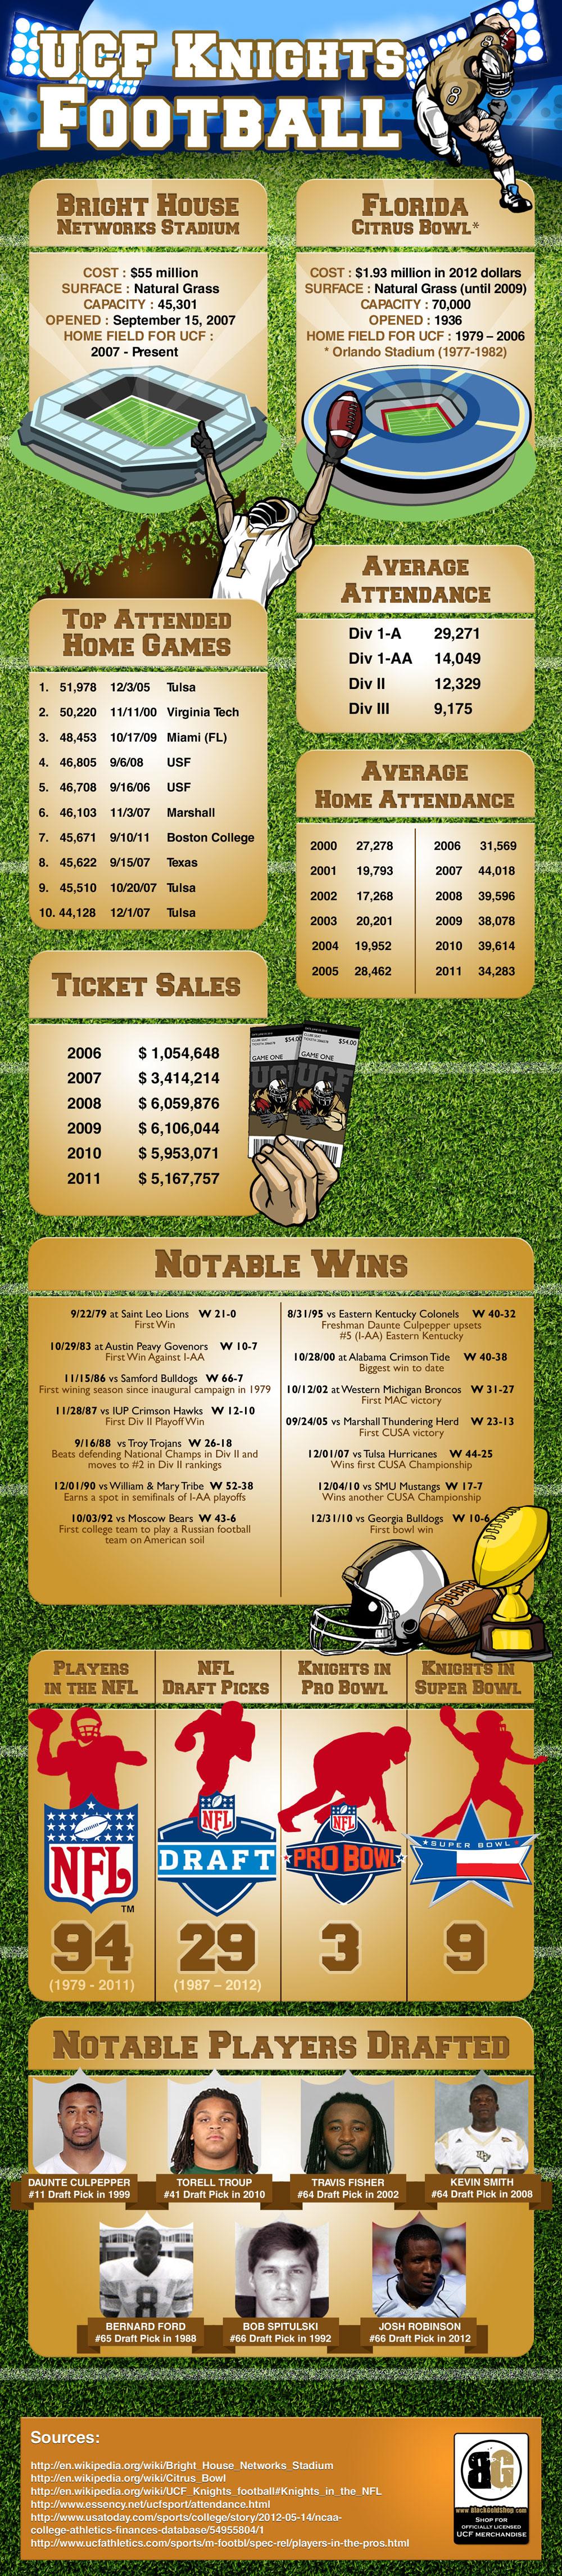 UCF Knights Football - A History